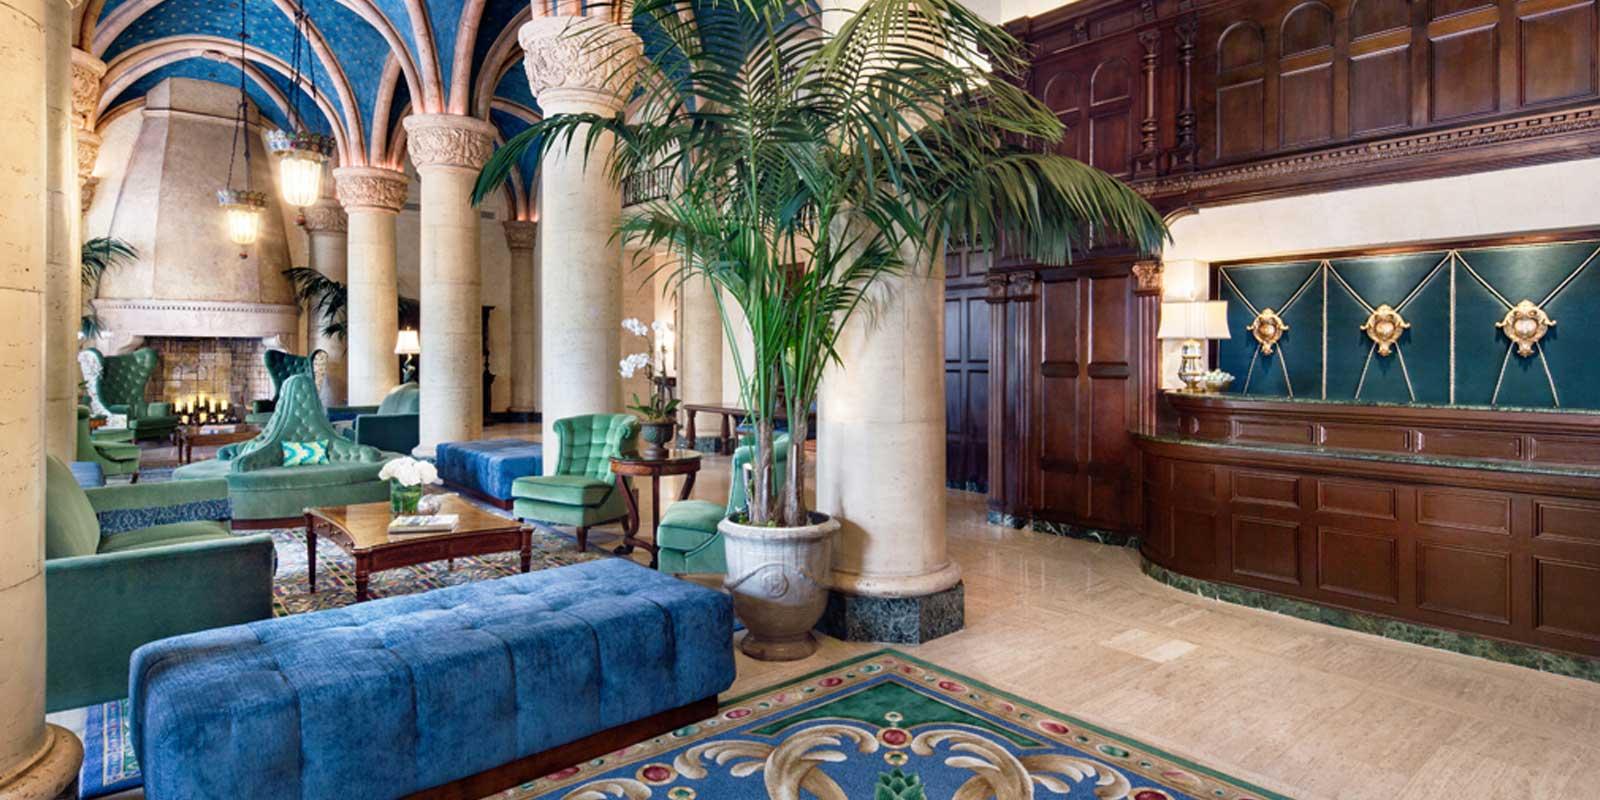 Biltmore Hotel Lobby